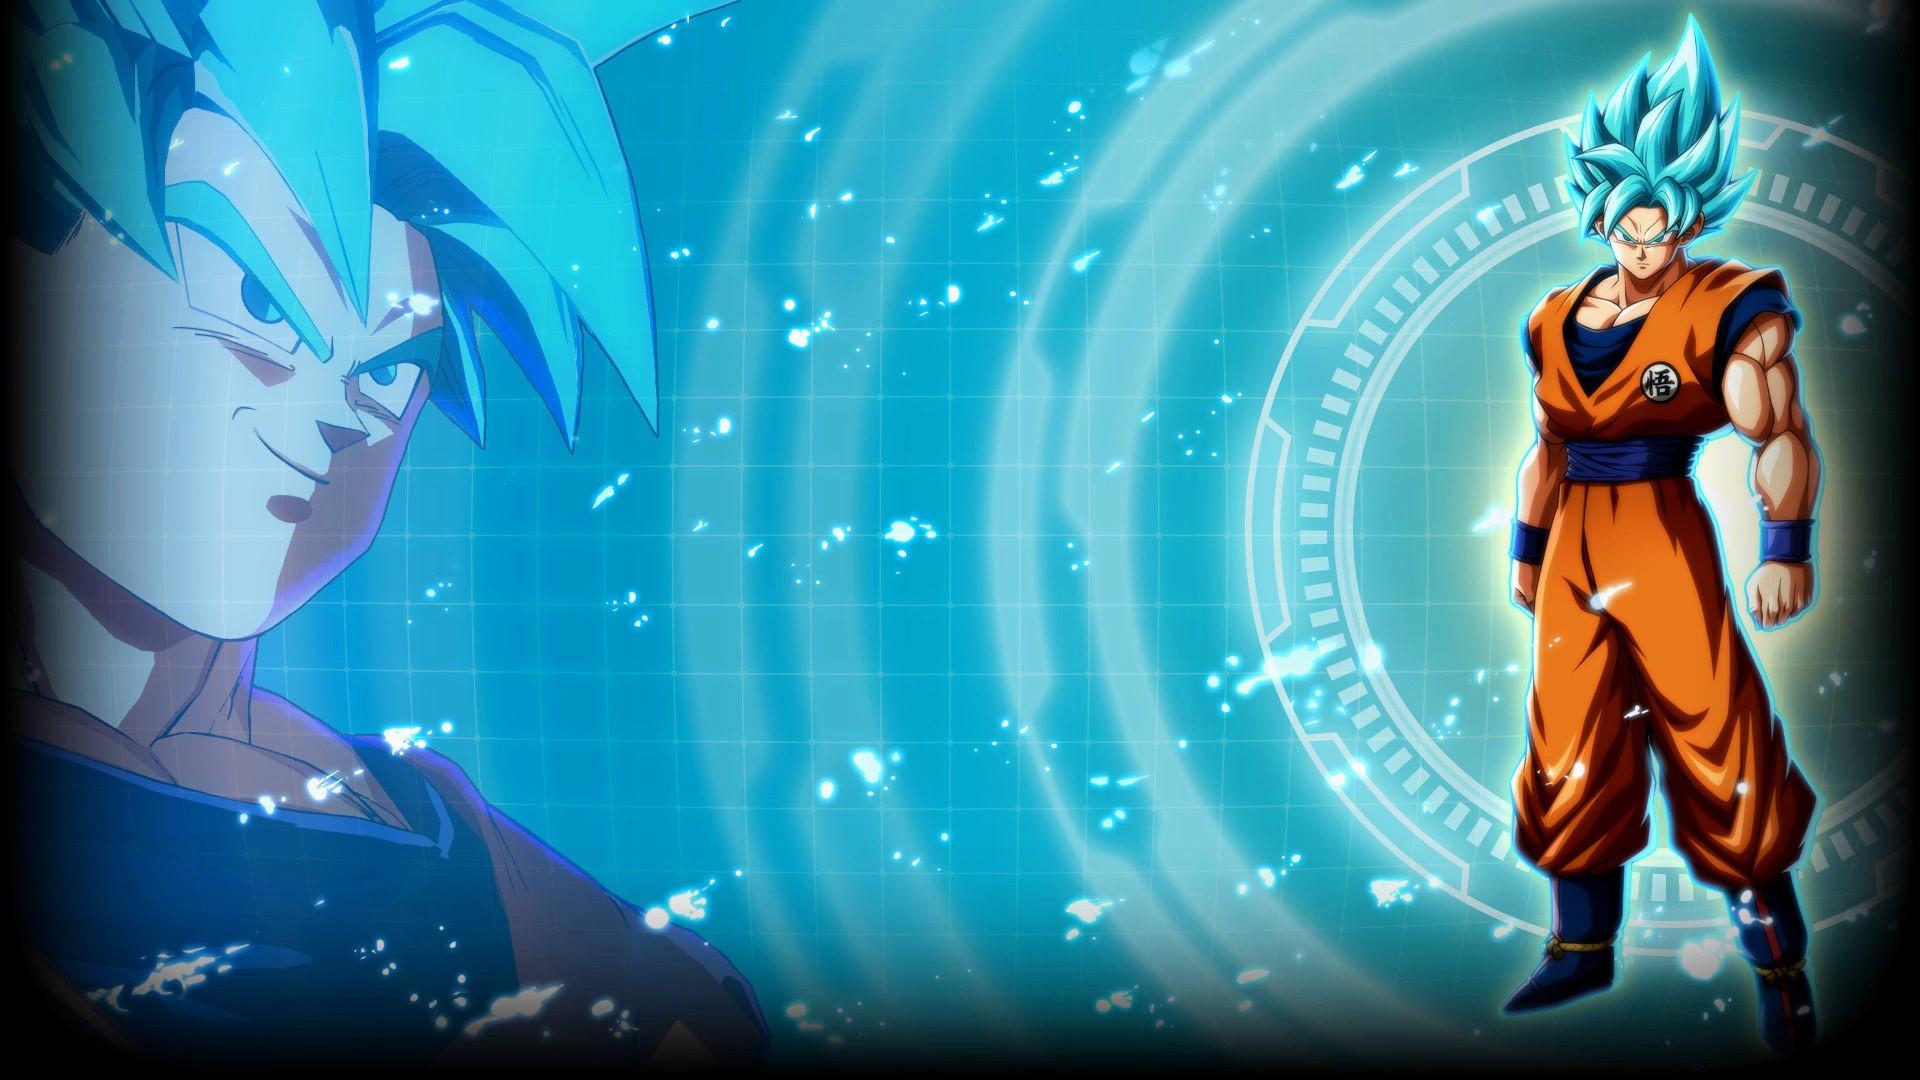 God Live Wallpaper Hd Super Saiyan Blue Goku Dragon Ball Fighterz Wallpapers